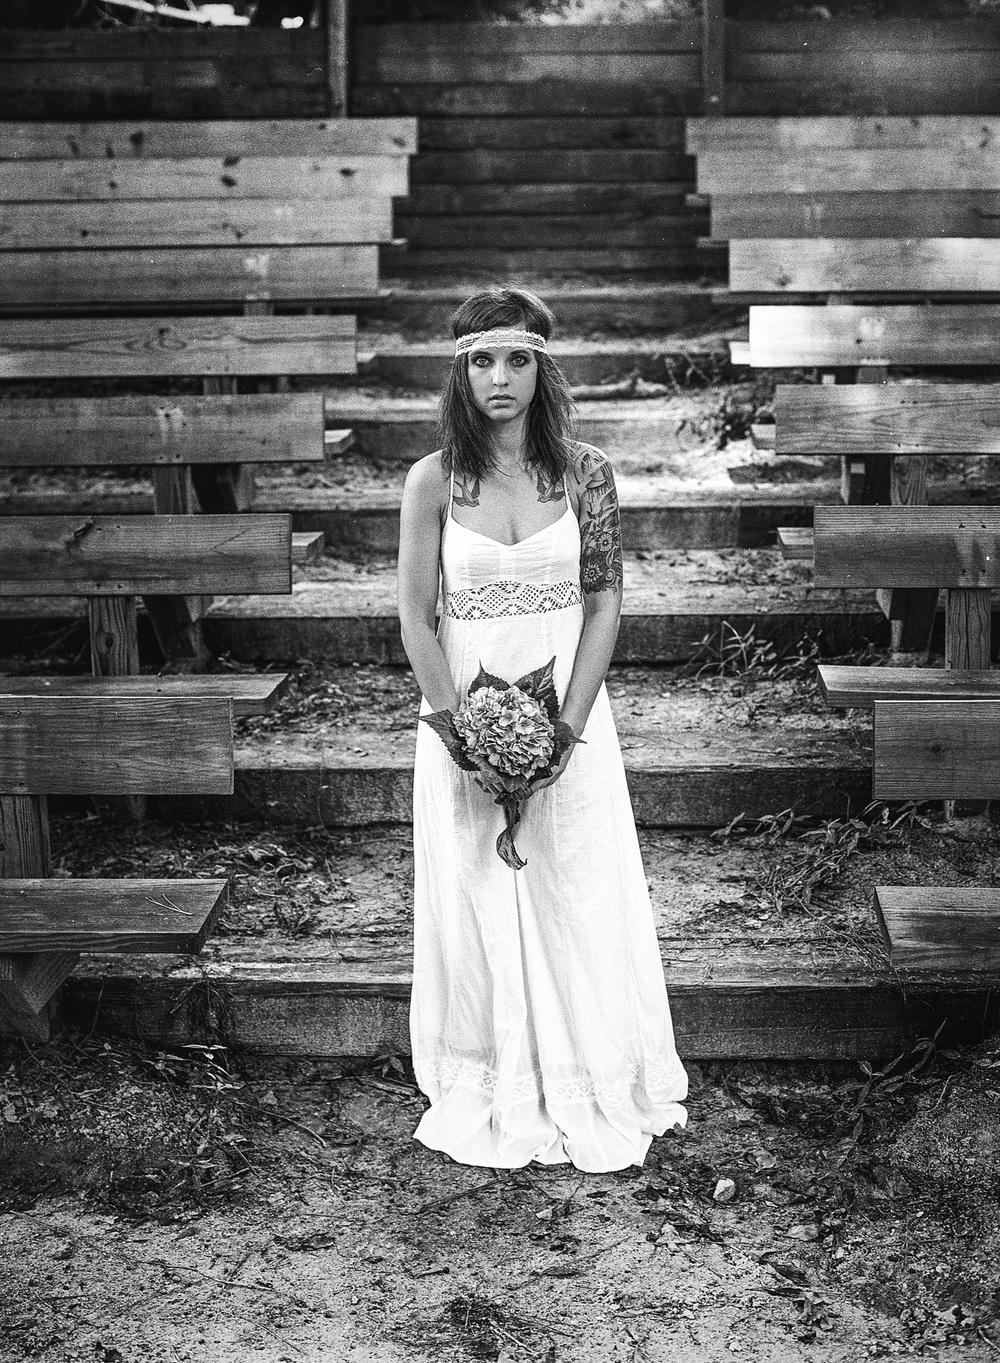 Photographer: Sharilyn Wells  Model: Patricia Dudley  Camera and Film: Mamiya 645/HP5+  © 2013 Sharilyn Wells Photography, LLC.